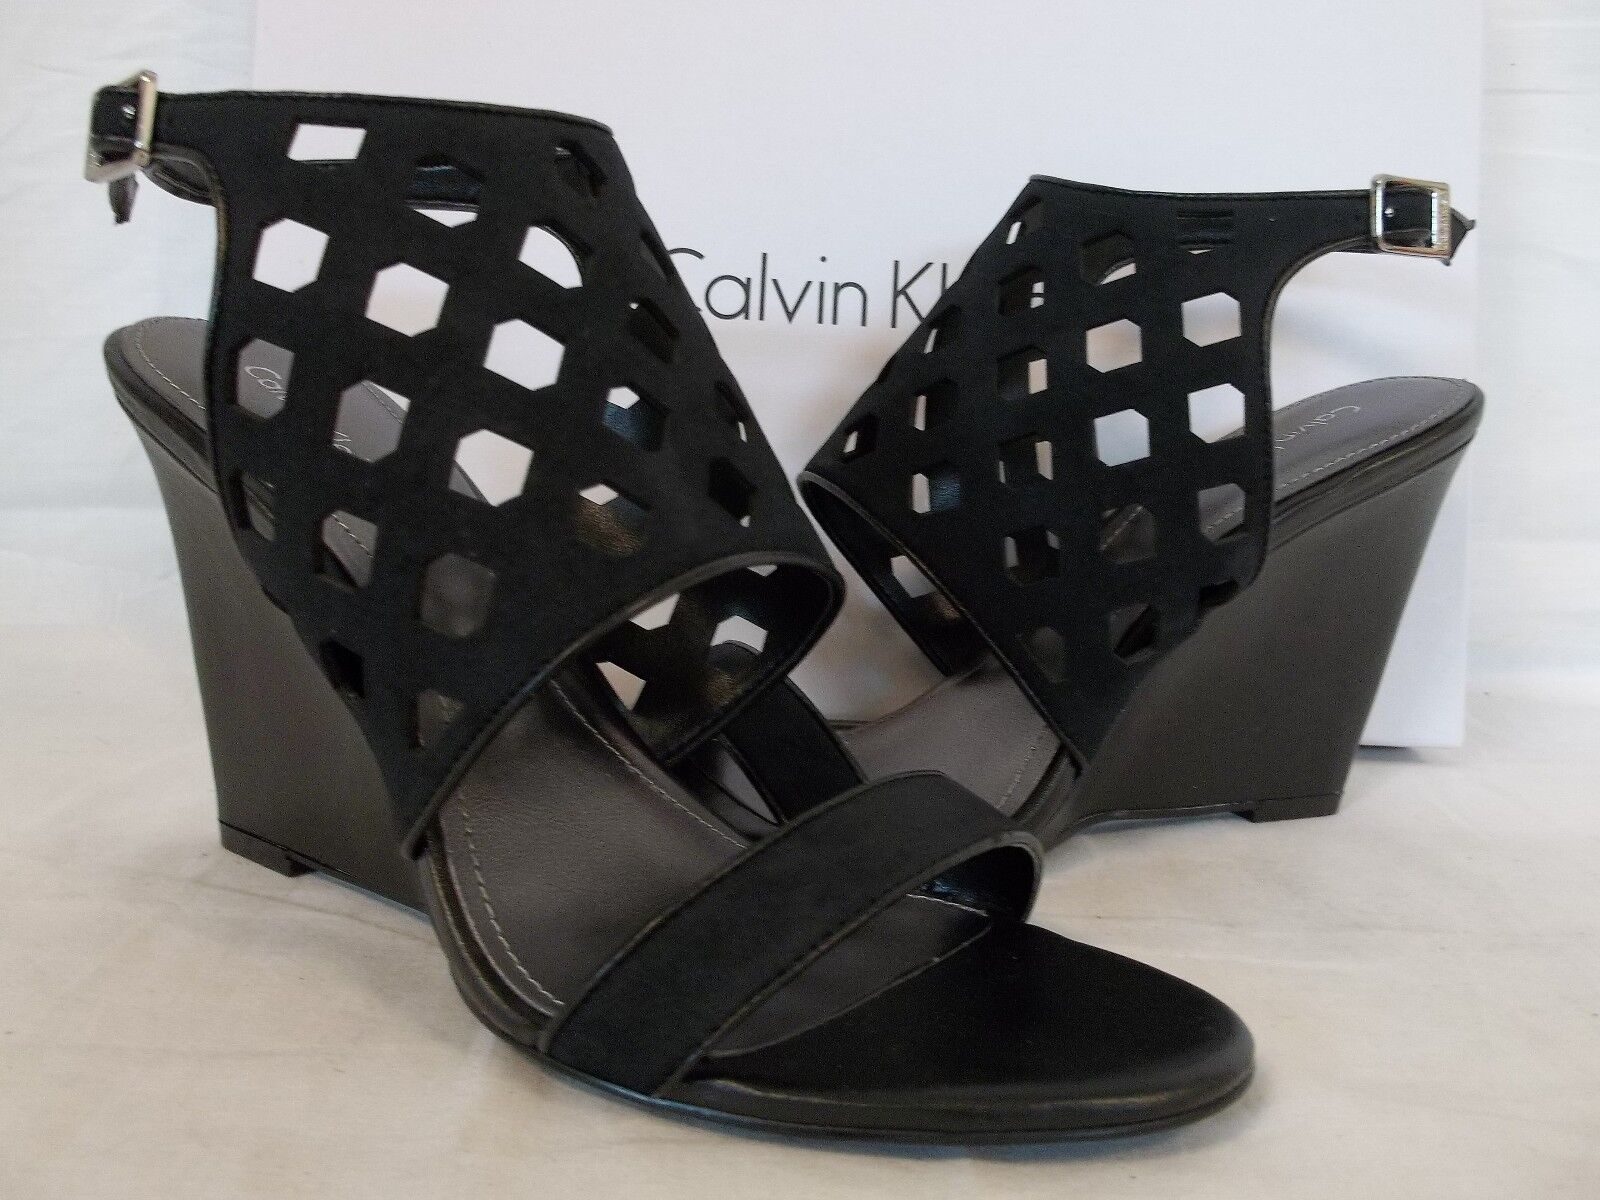 Calvin Klein Sz 9 M Meron Black Nubuck Leather Open Toe Wedges New Womens Shoes